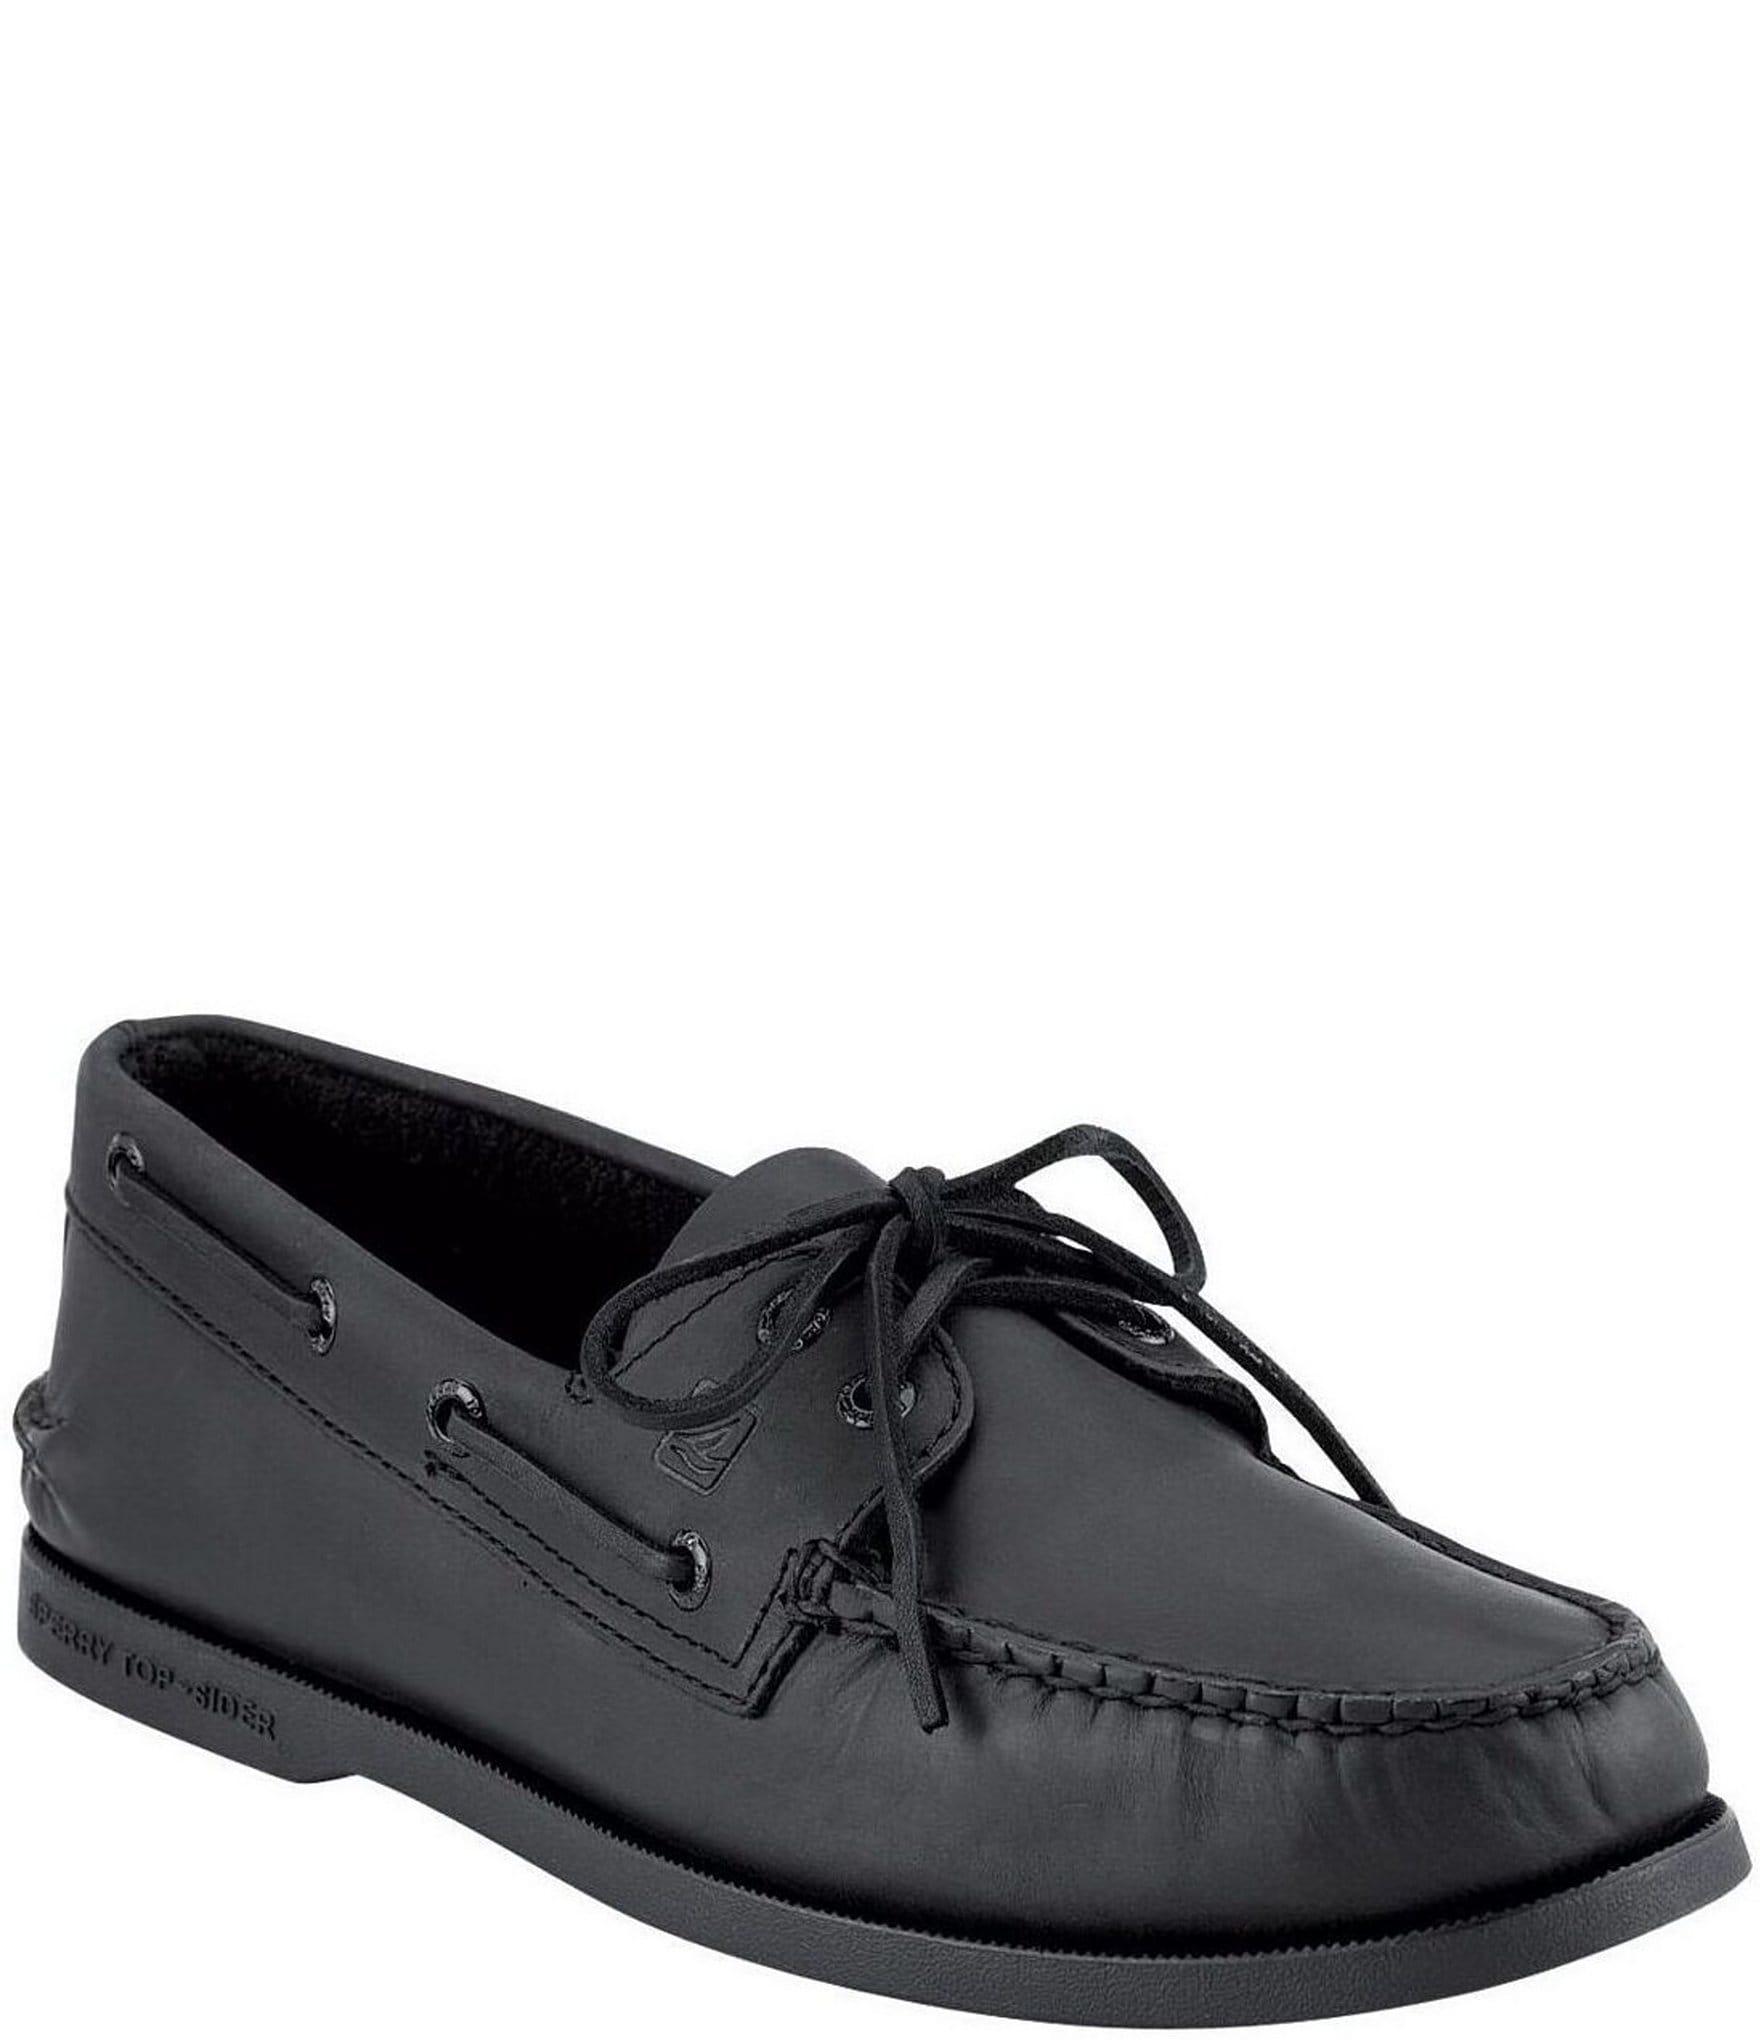 Sperry Black Men's Shoes | Dillard's